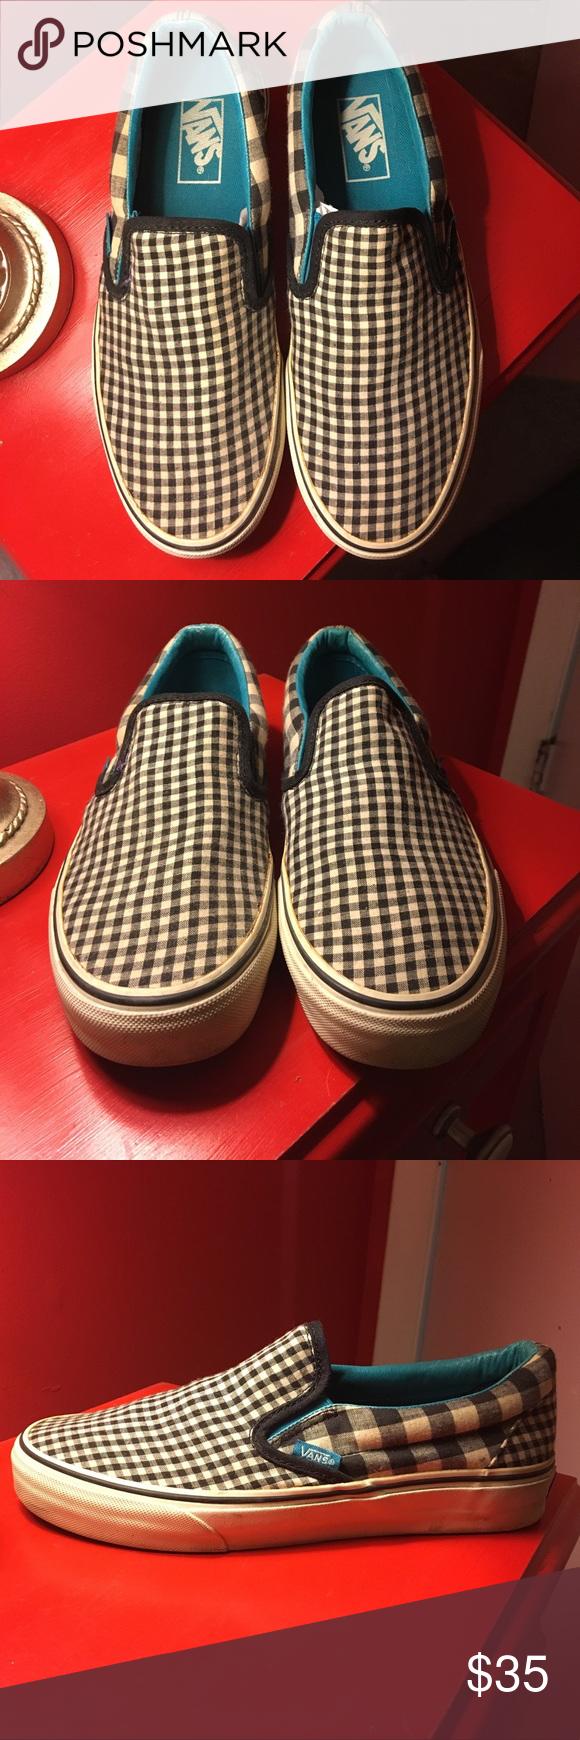 Vans Black \u0026 White Checkered Slip-ons